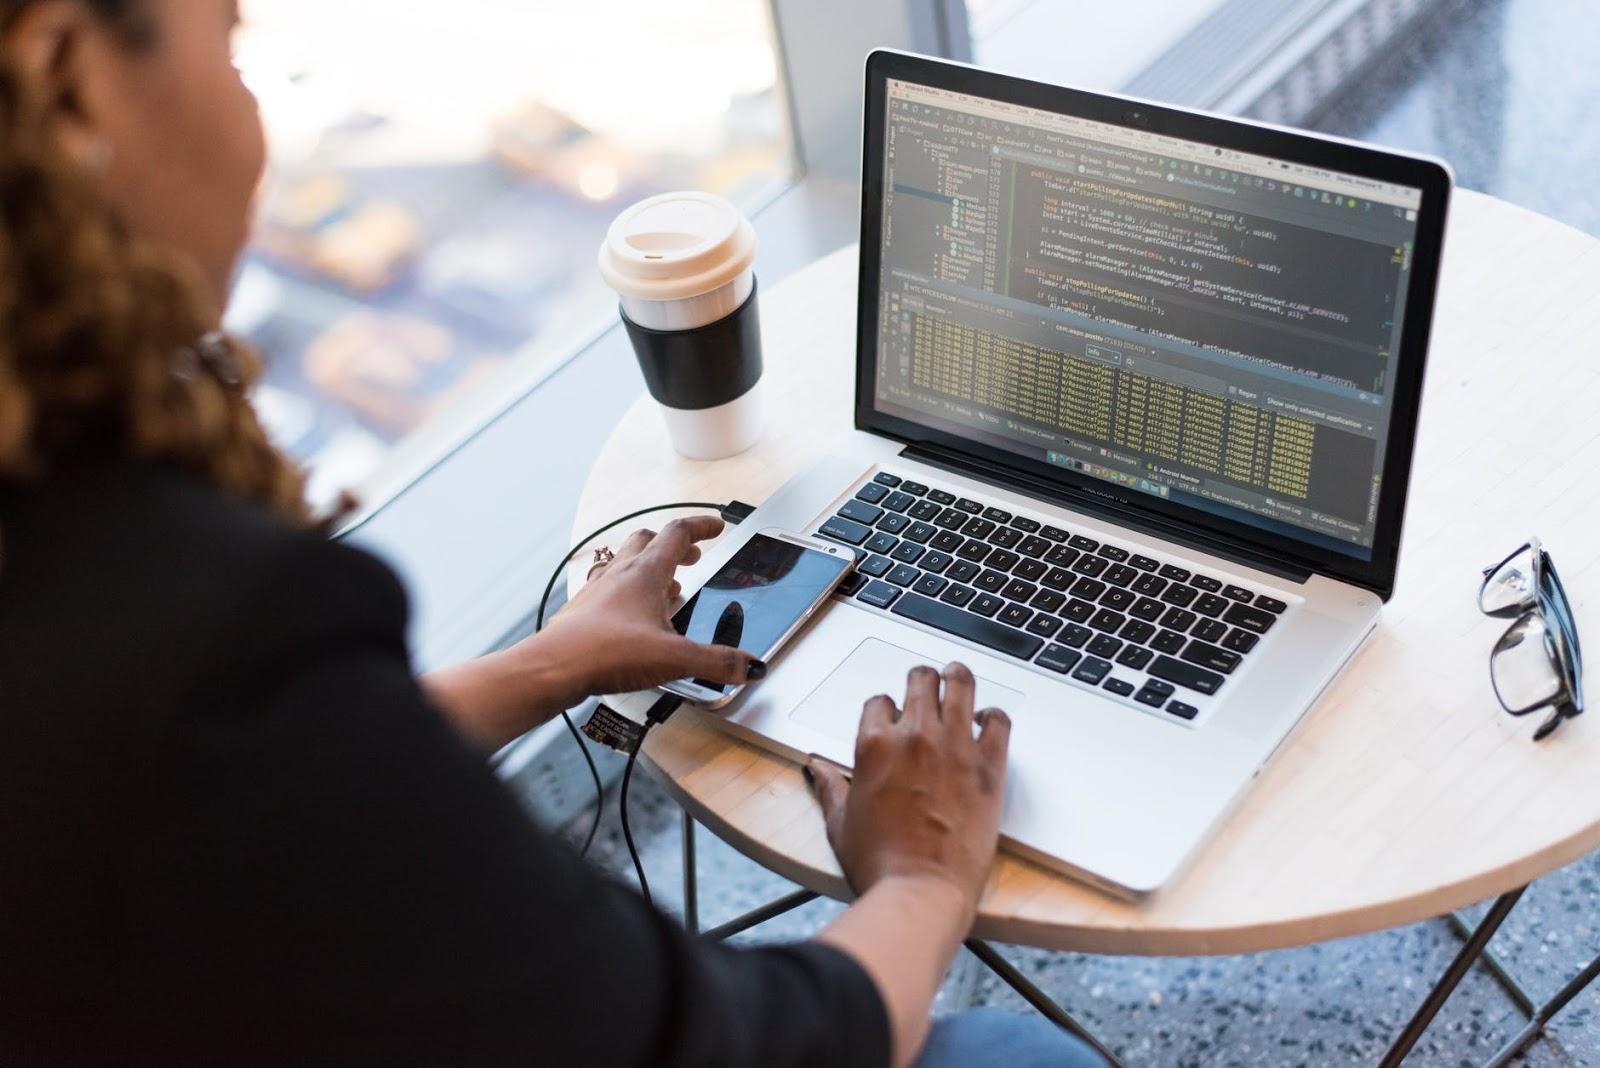 Best Pro Tips to Install WordPress in 2021